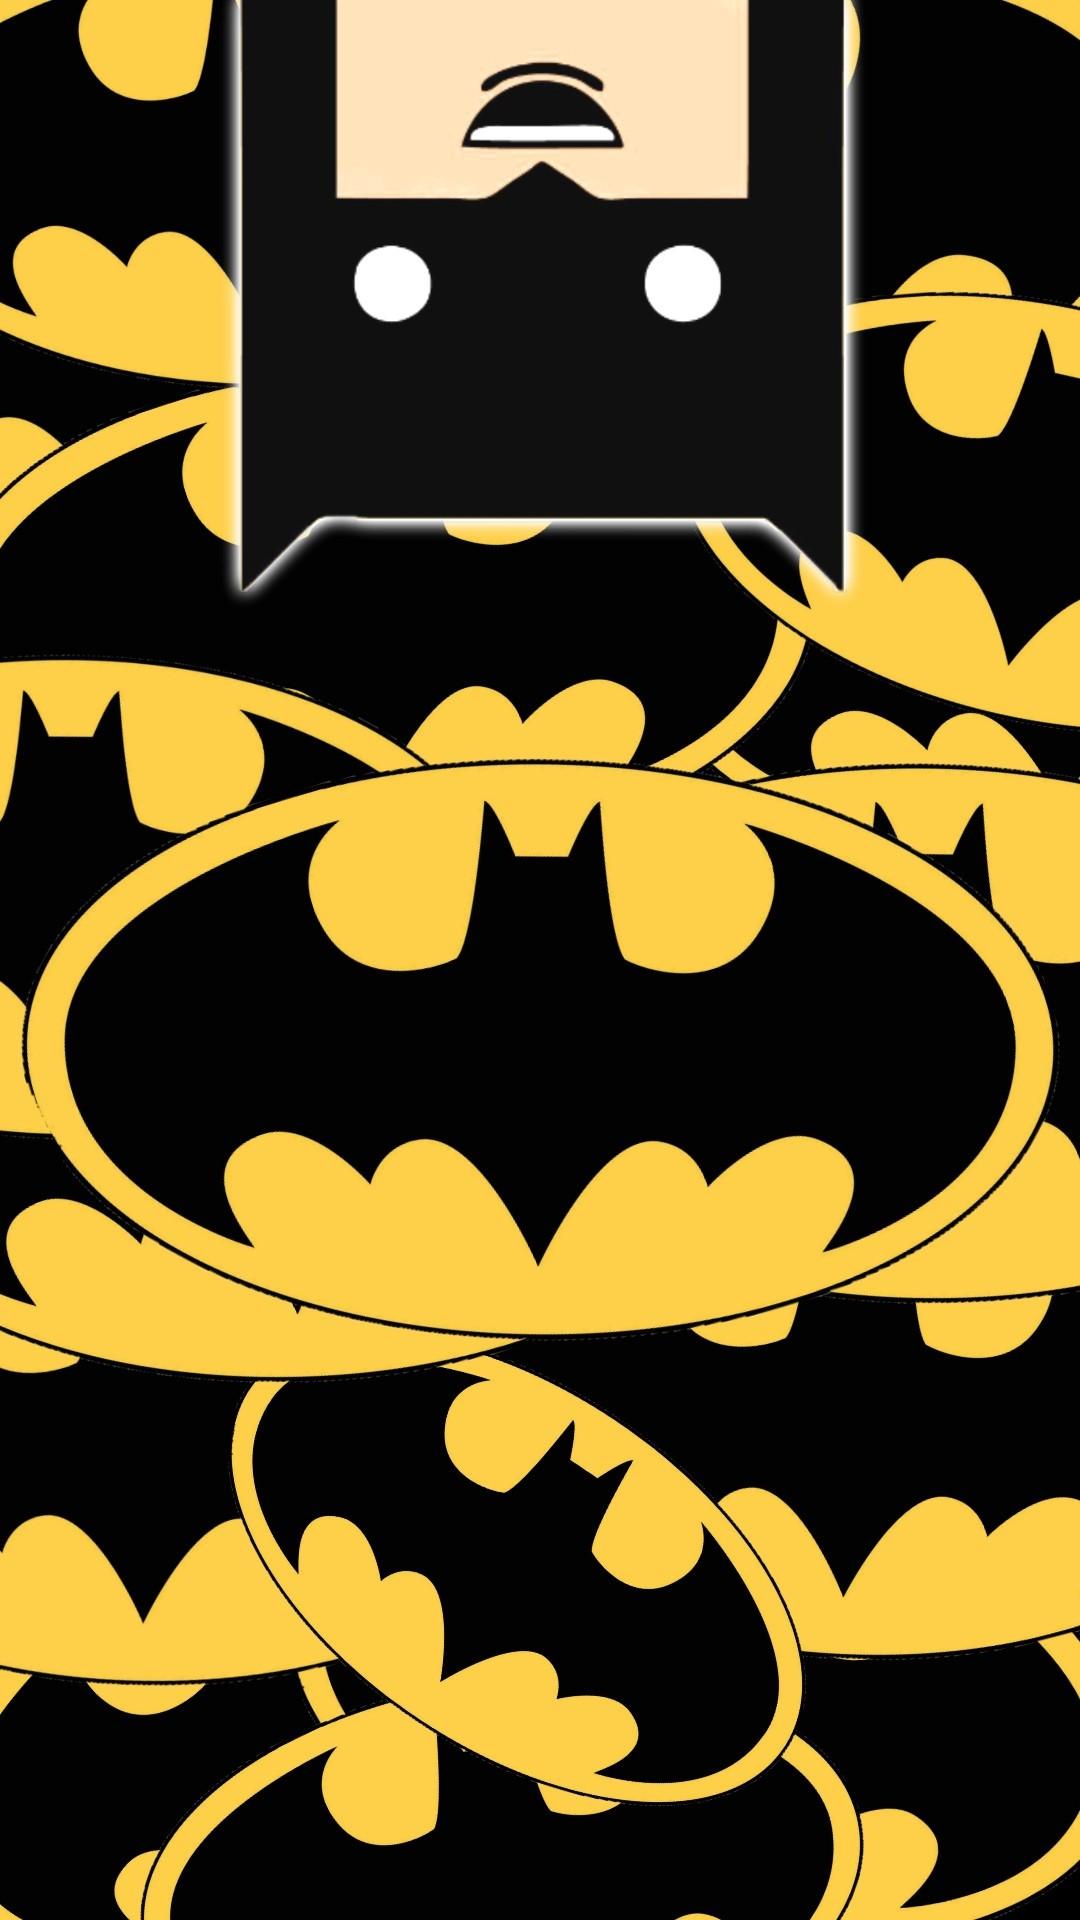 Batman lock screen wallpaper 63 images 1080x1920 batman logo wallpaper for android clipartsgram voltagebd Image collections